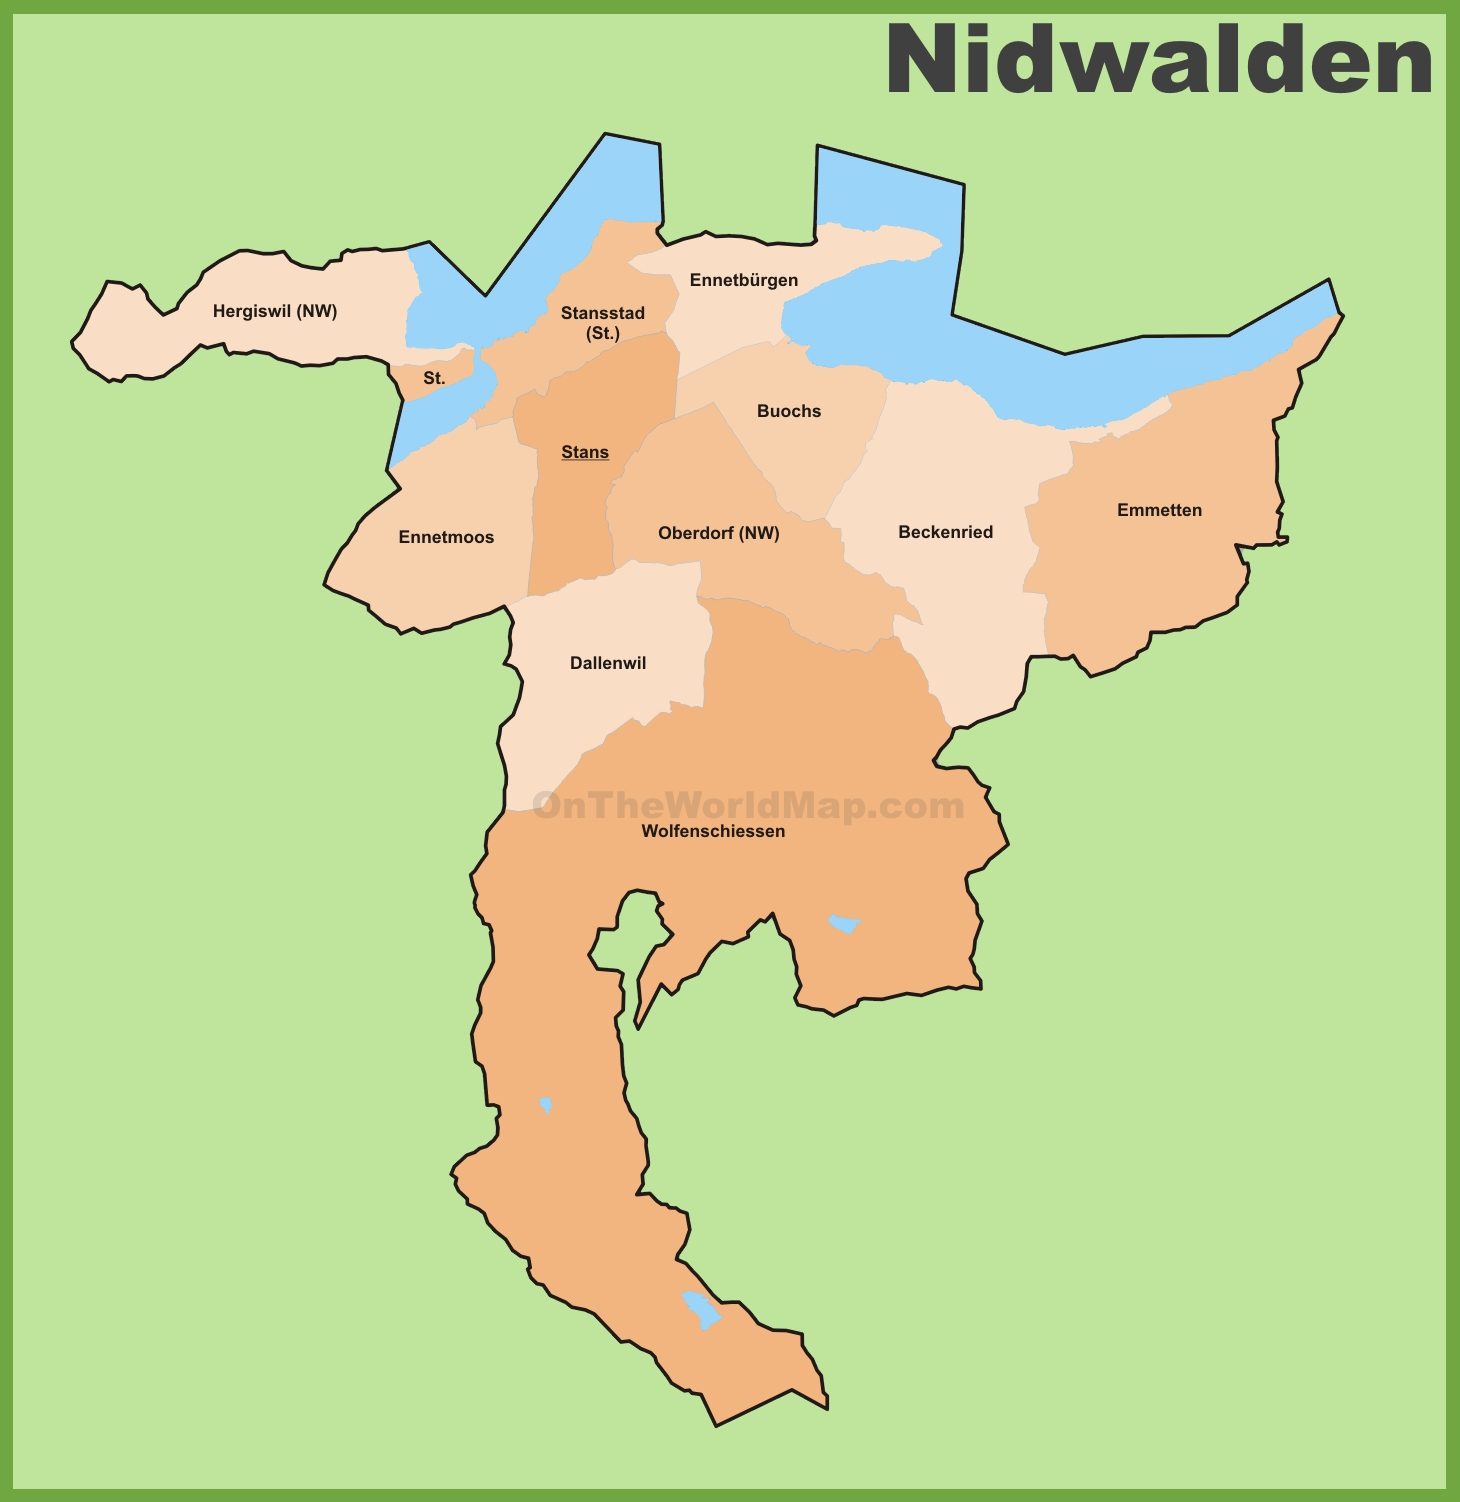 Canton of Nidwalden municipality map